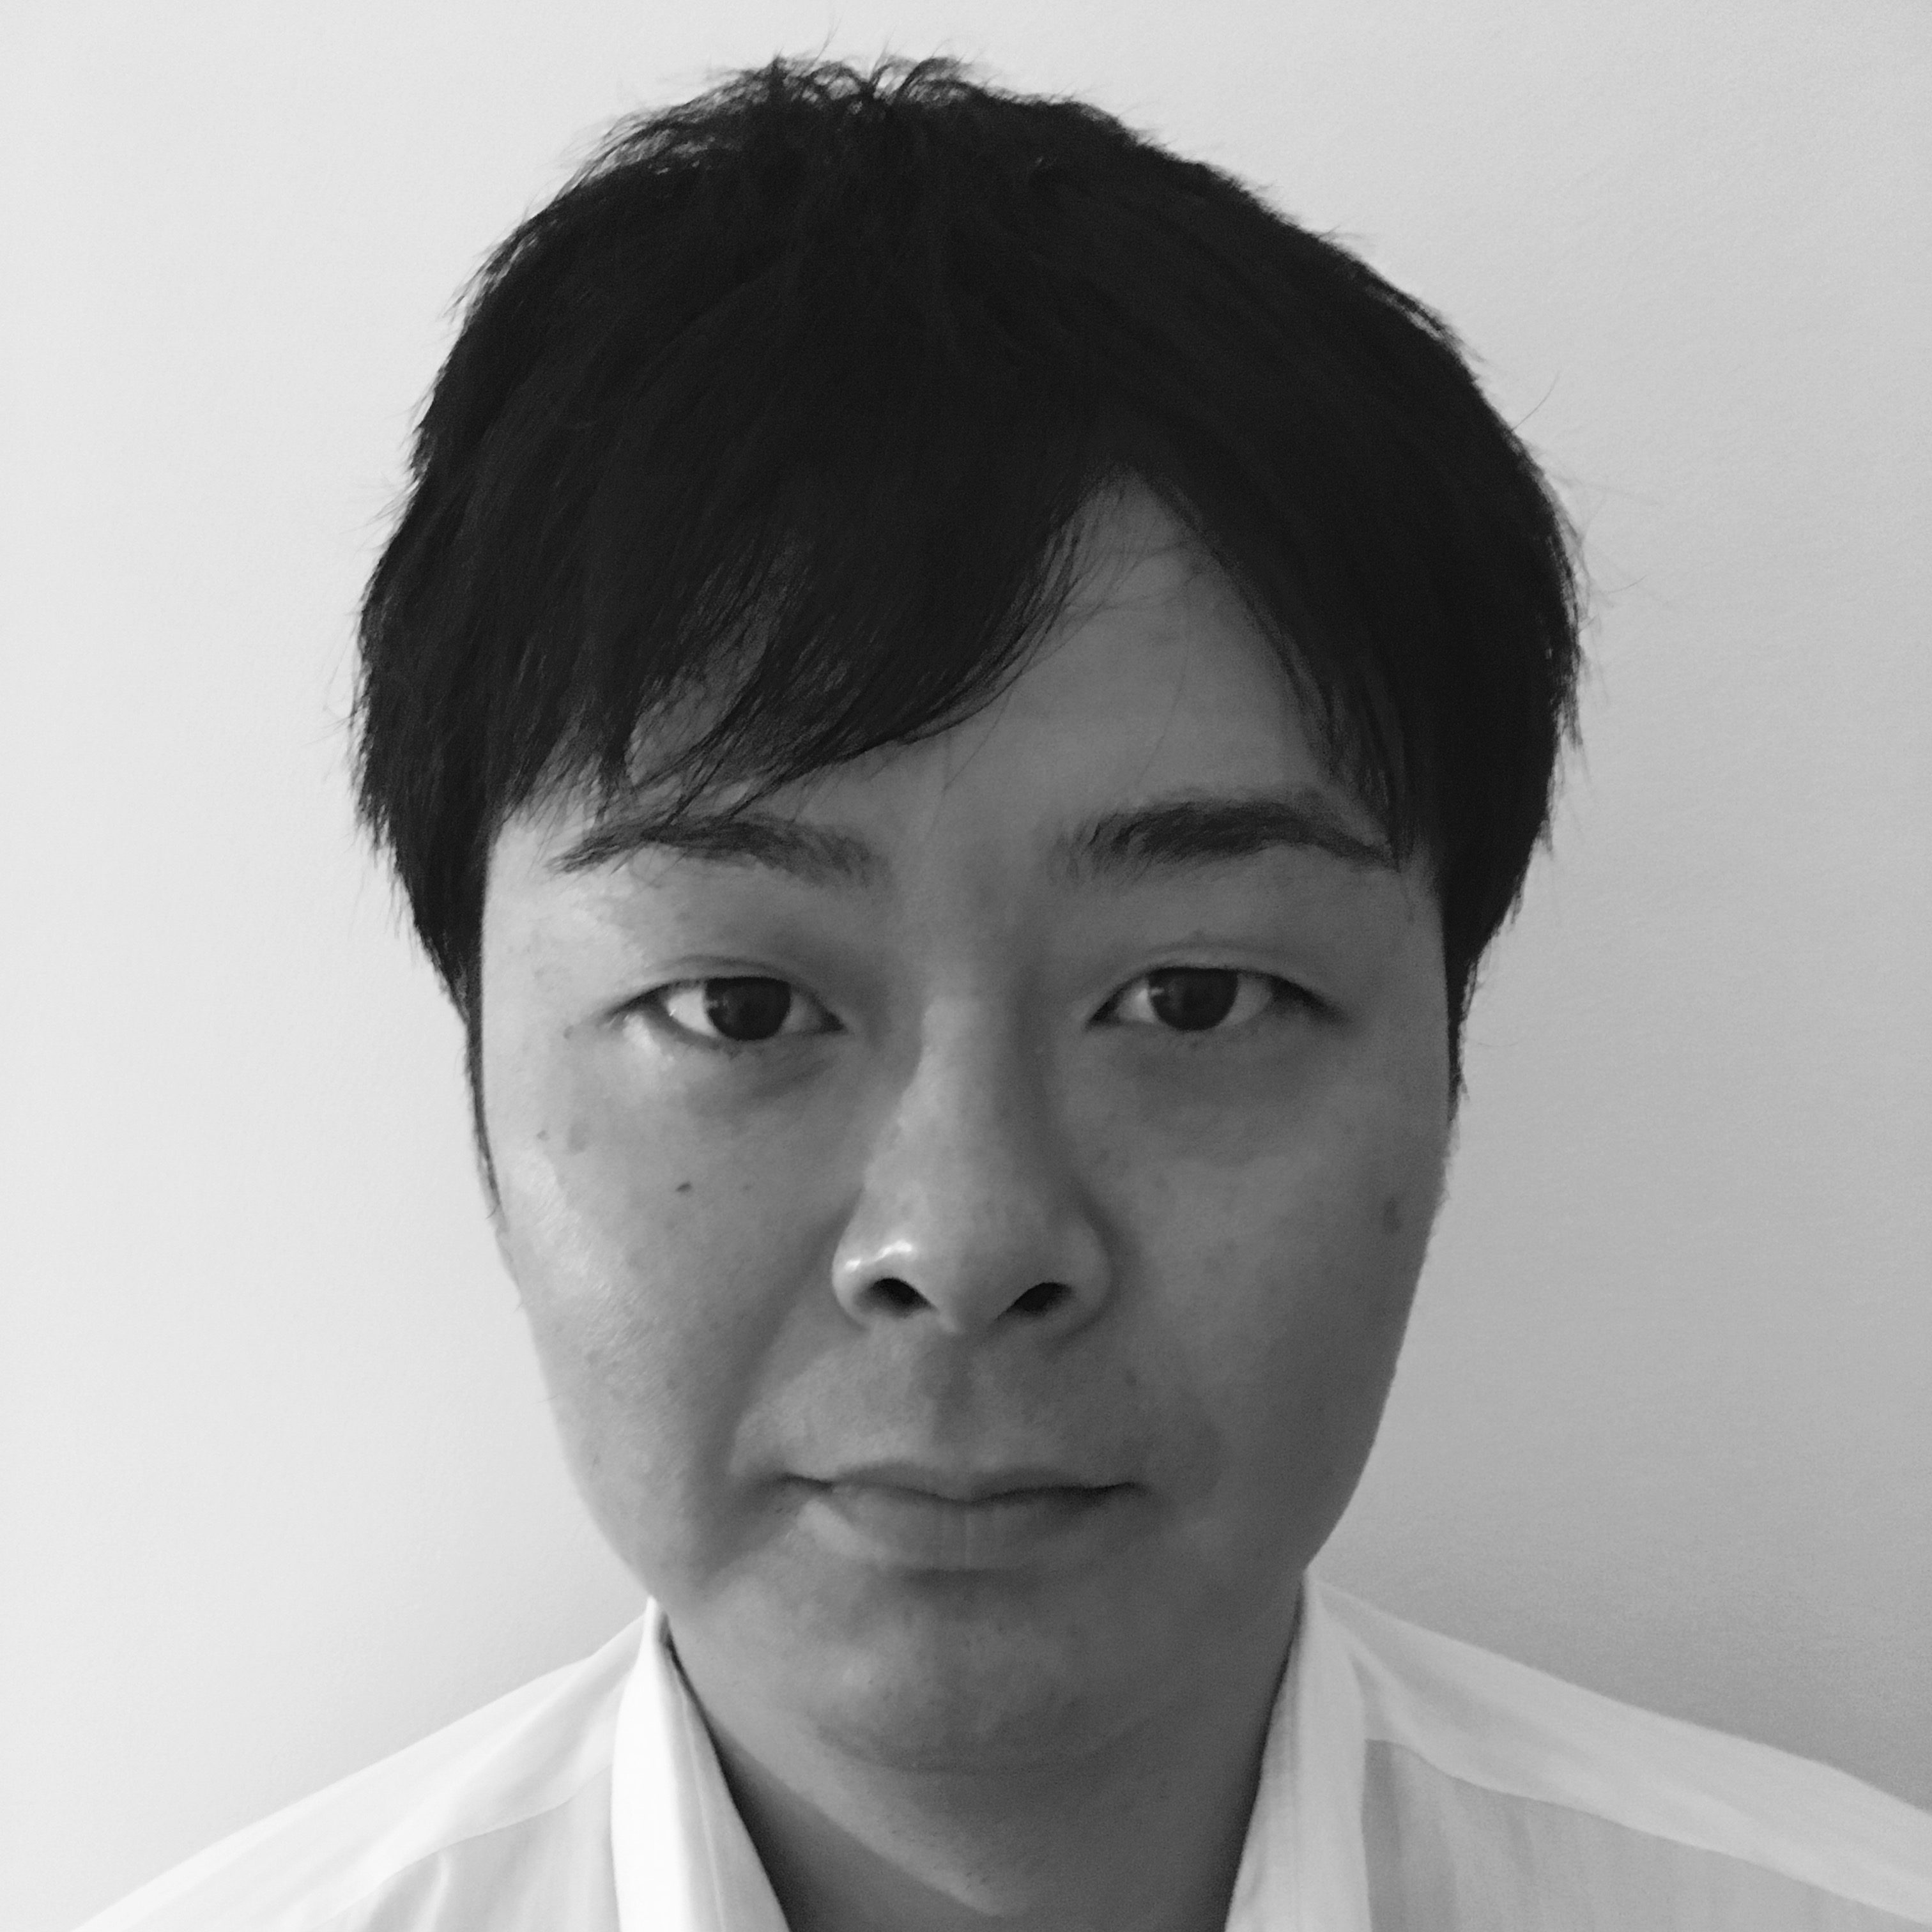 Mr Kentaro Yamanaka